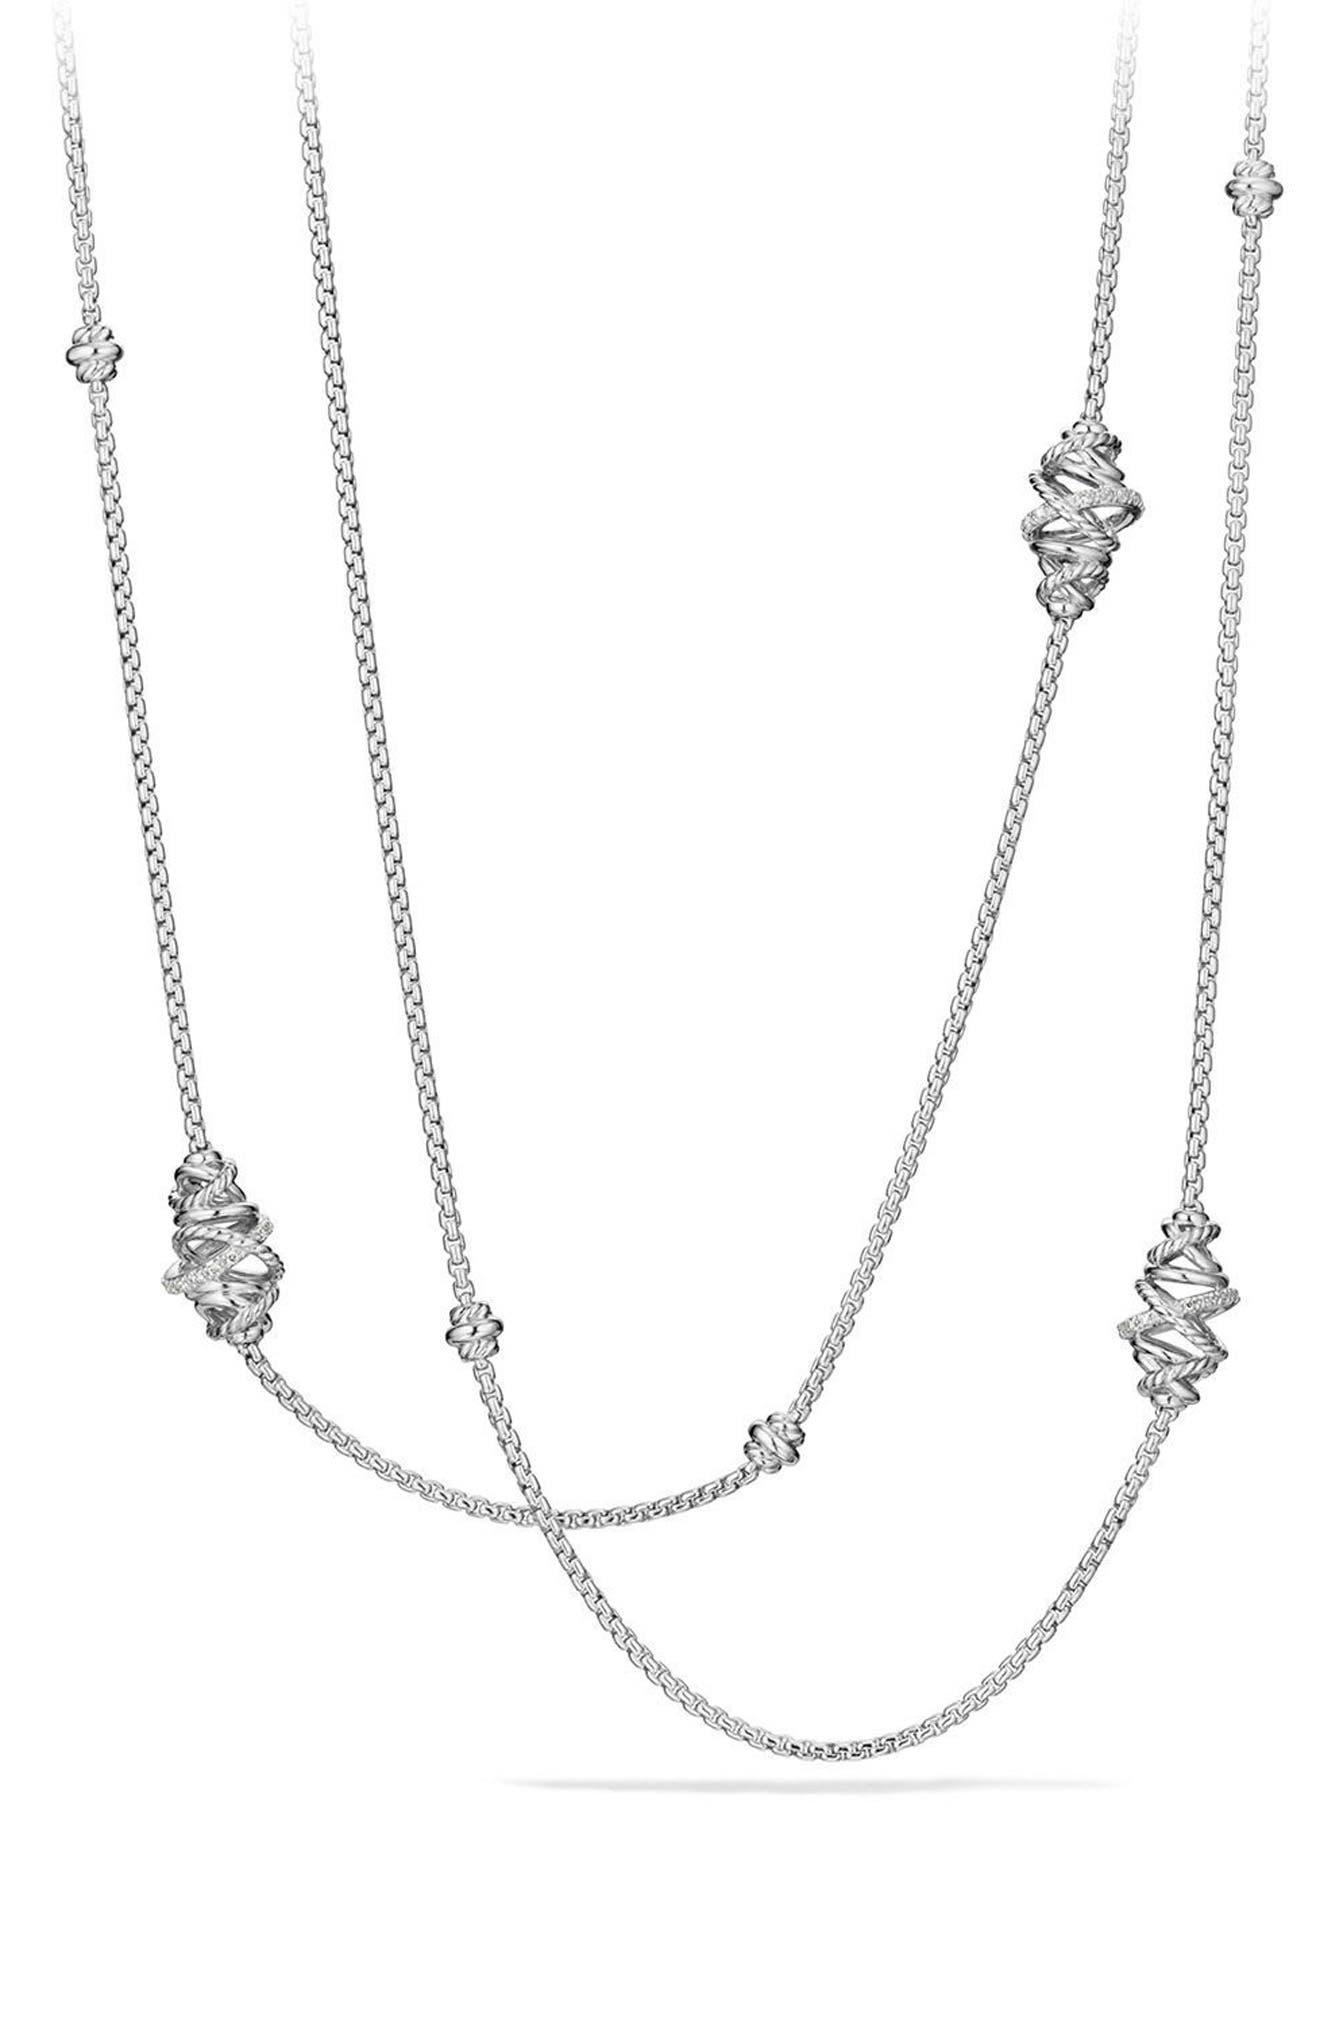 Main Image - David Yurman Crossover Station Necklace with Diamonds